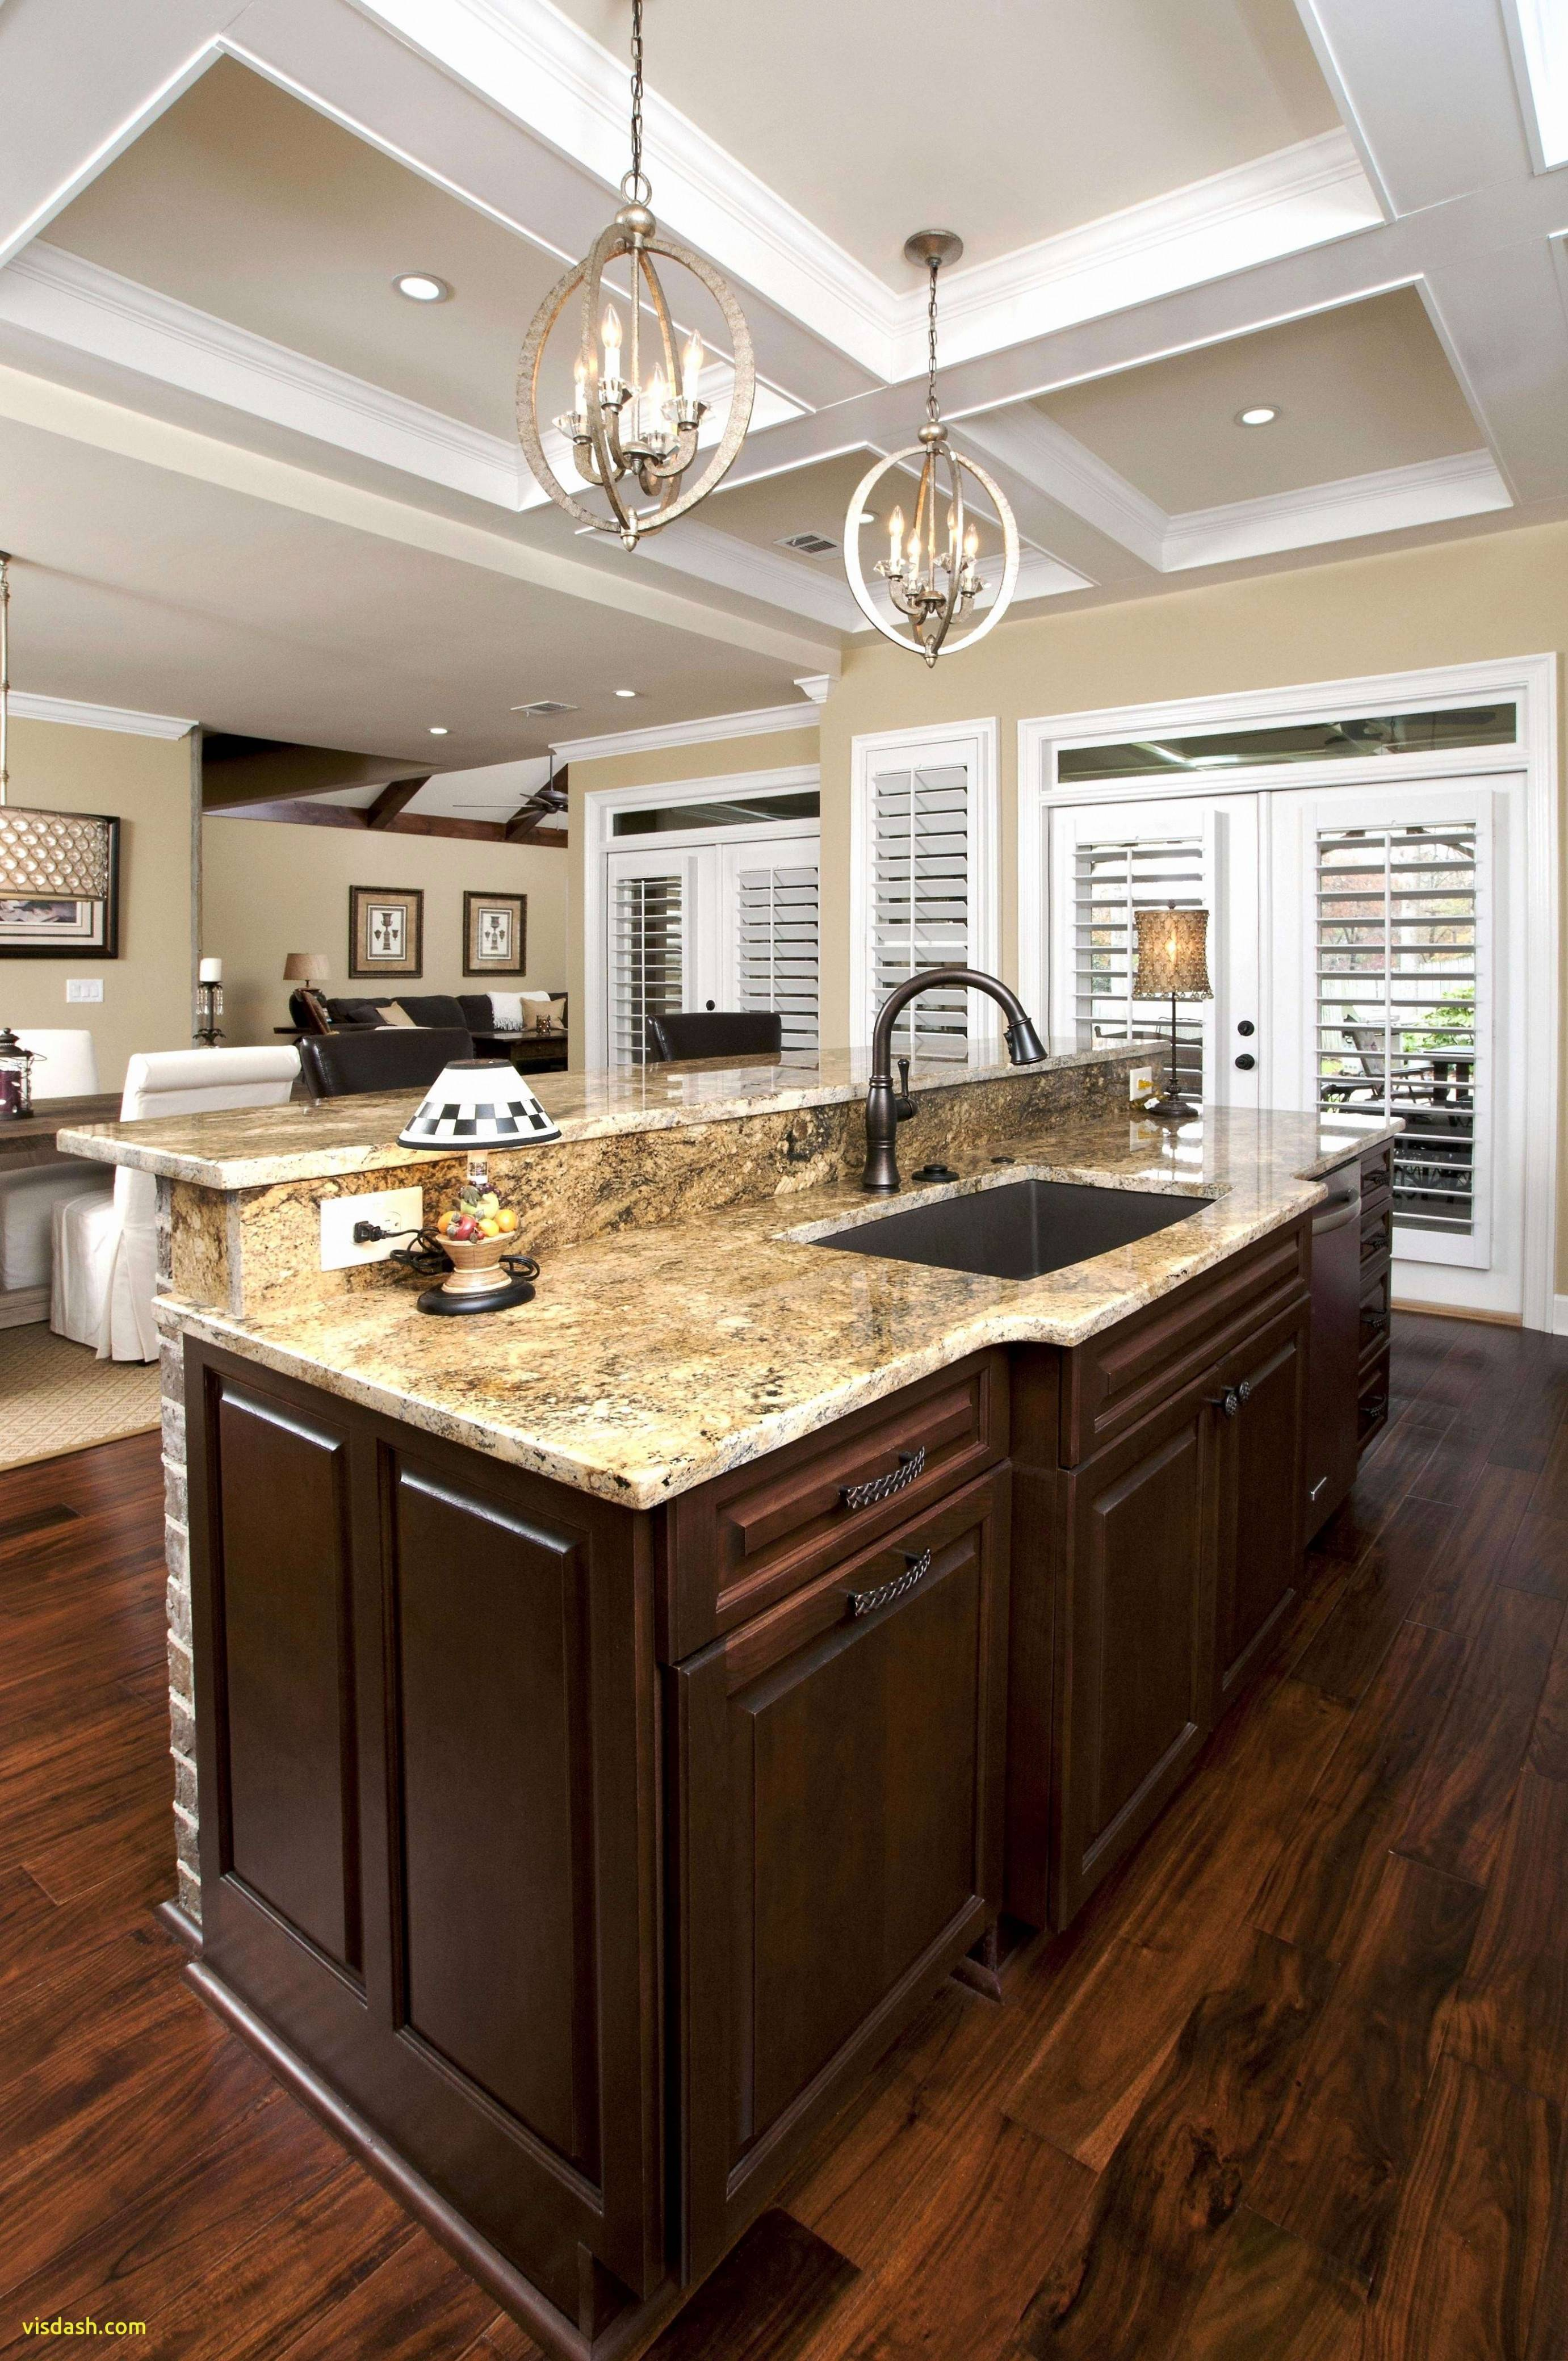 white kitchen with hardwood floors of white kitchen cabinets jackolanternliquors within cabinet for kitchen best exclusive kitchen designs alluring kitchen cabinet 0d bright lights